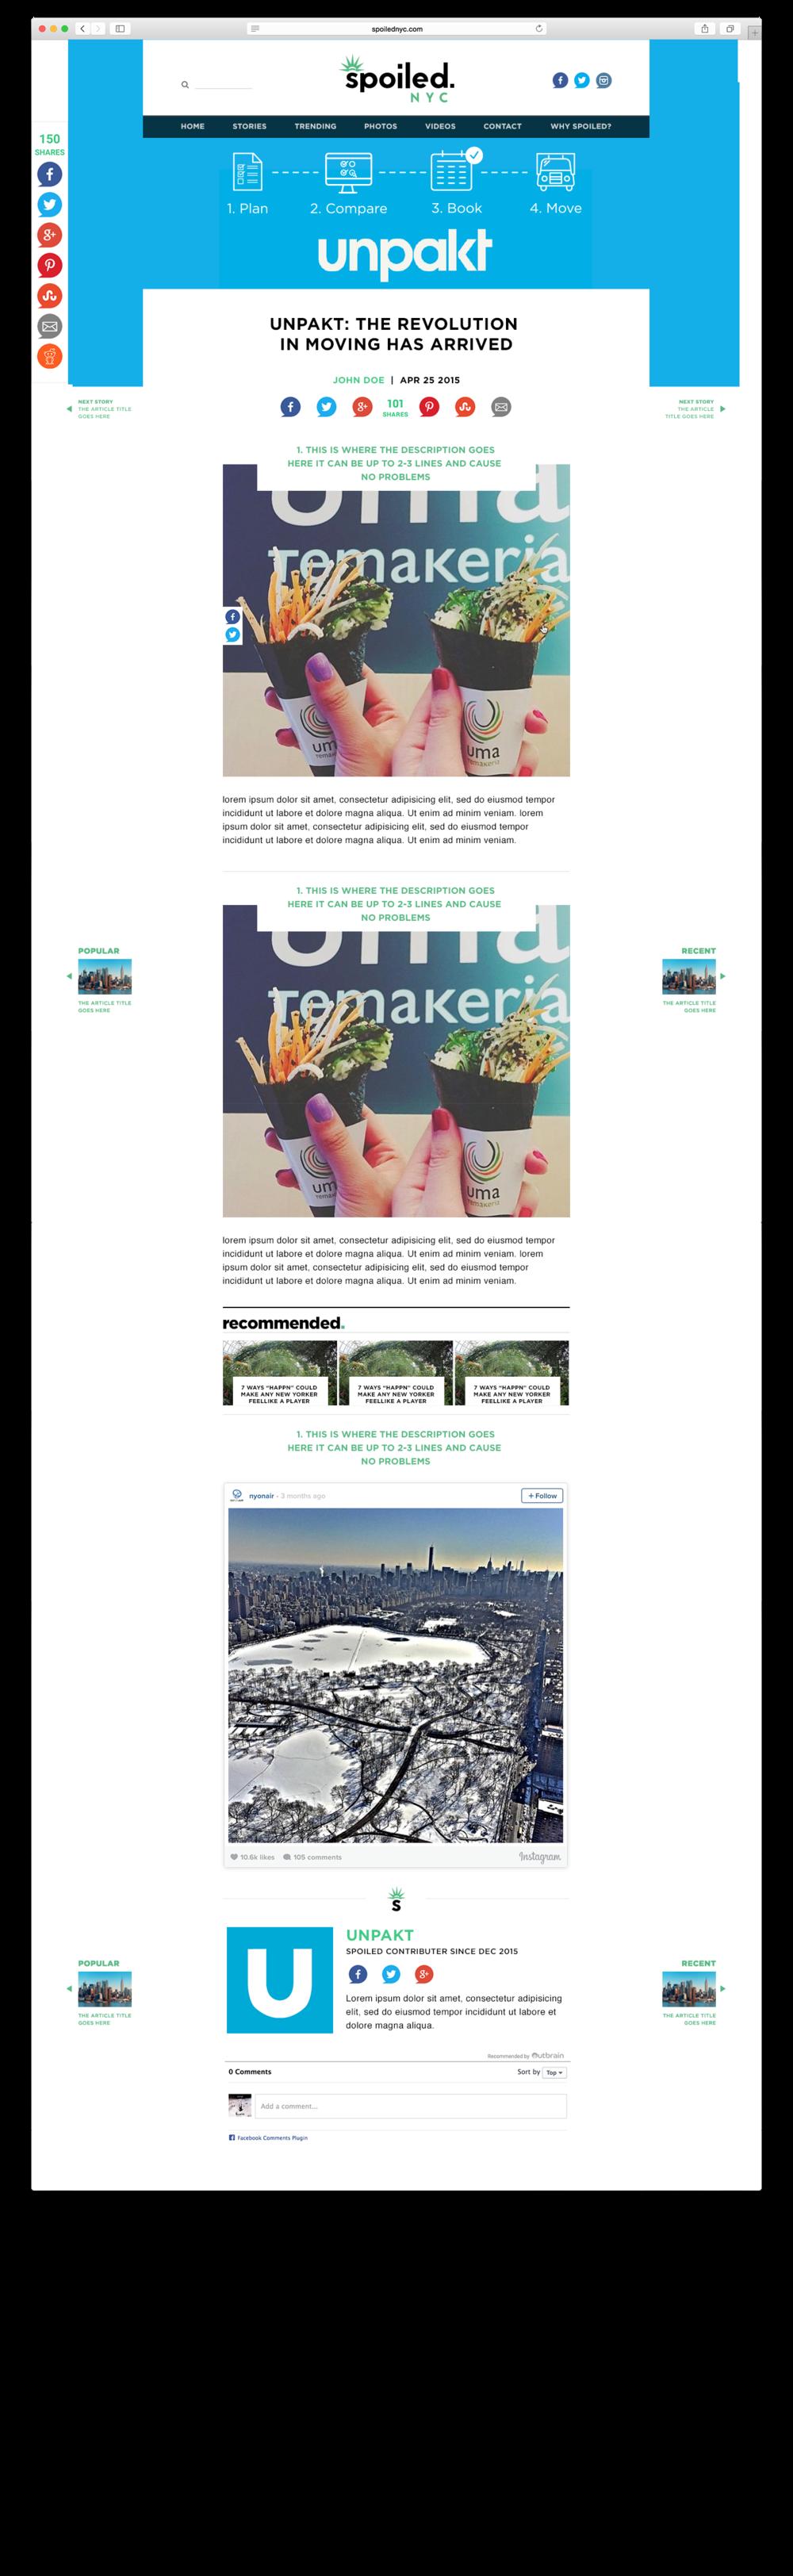 SPLD_ARTICLE_Unpakt.png